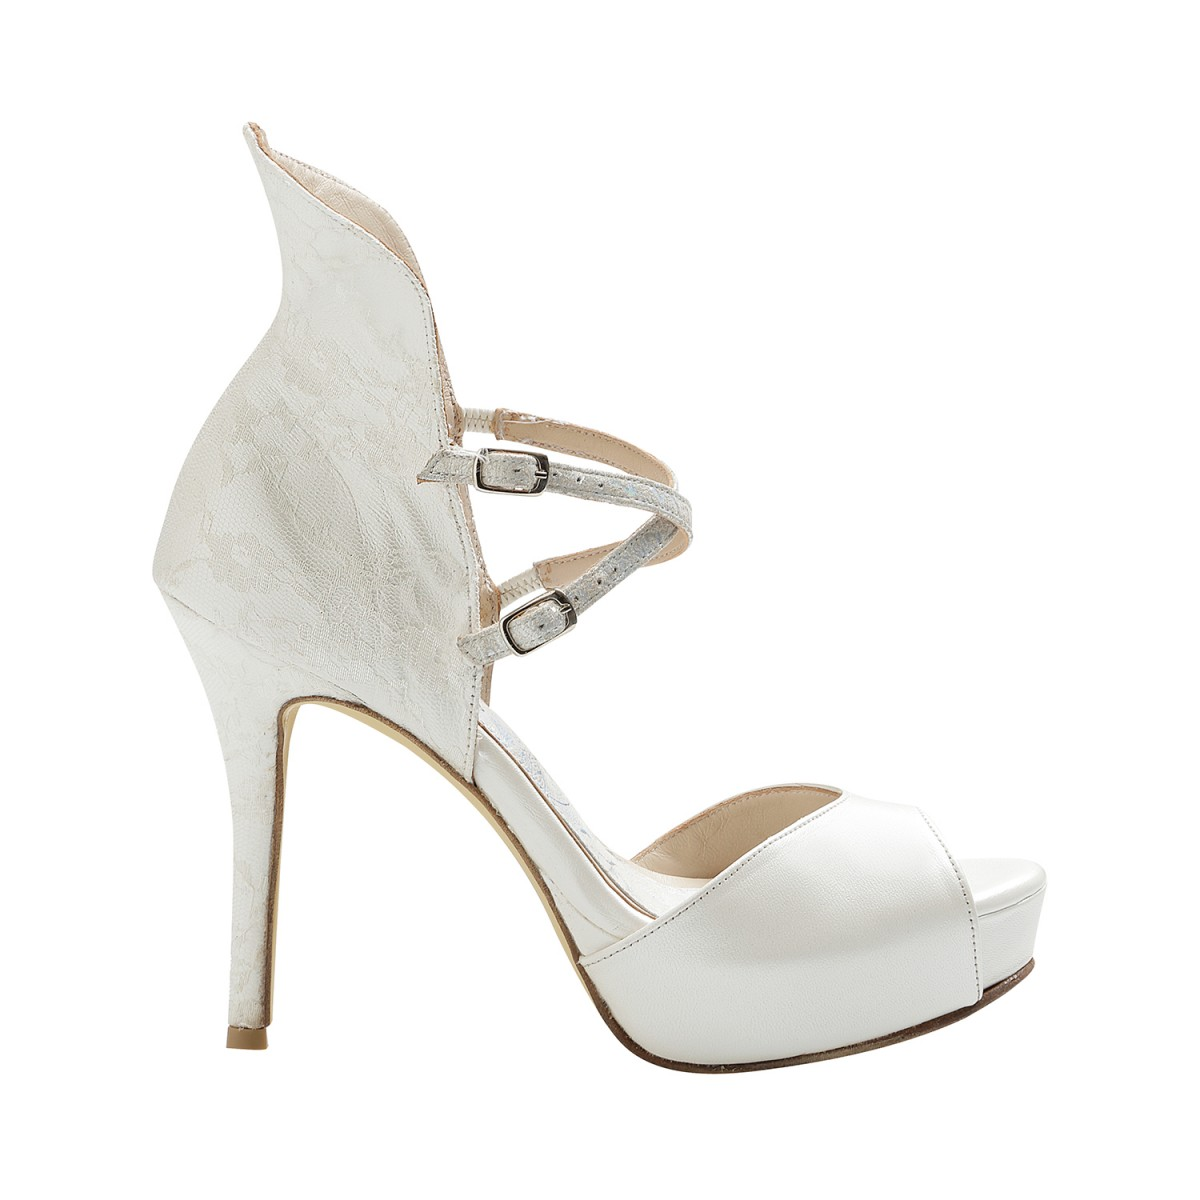 59c899c4cc9 facebook: shoes divina